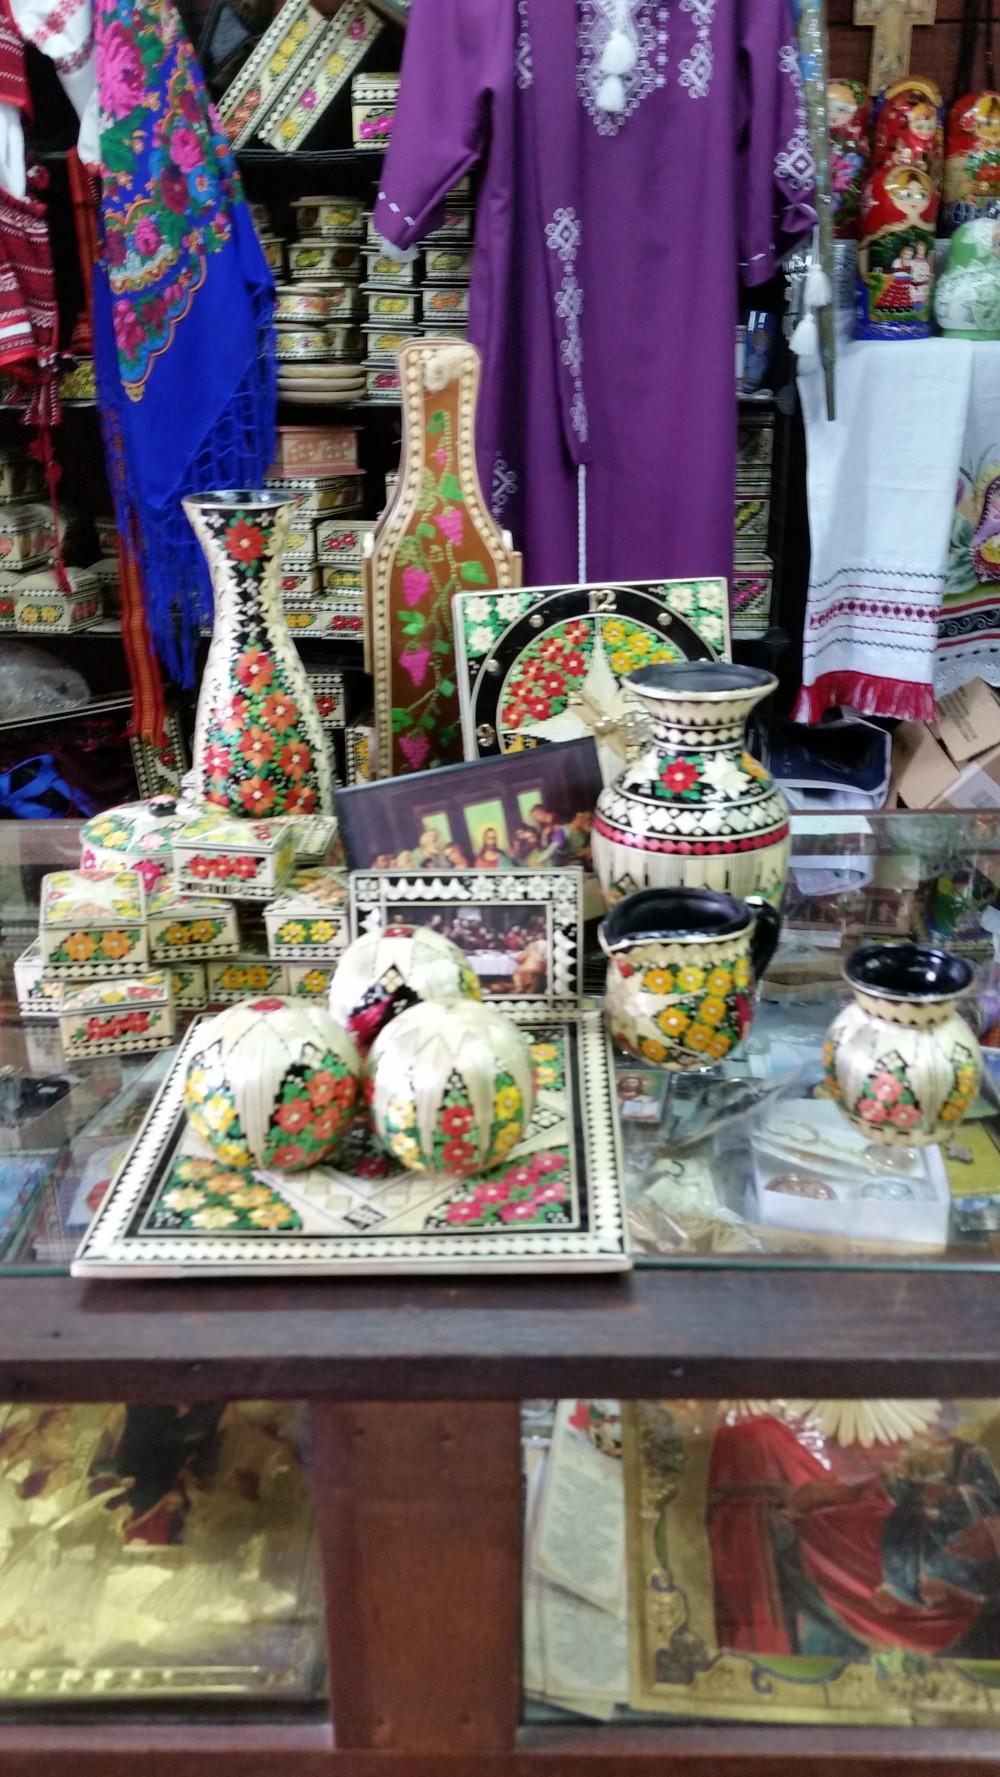 Ukrainian crafts for sale